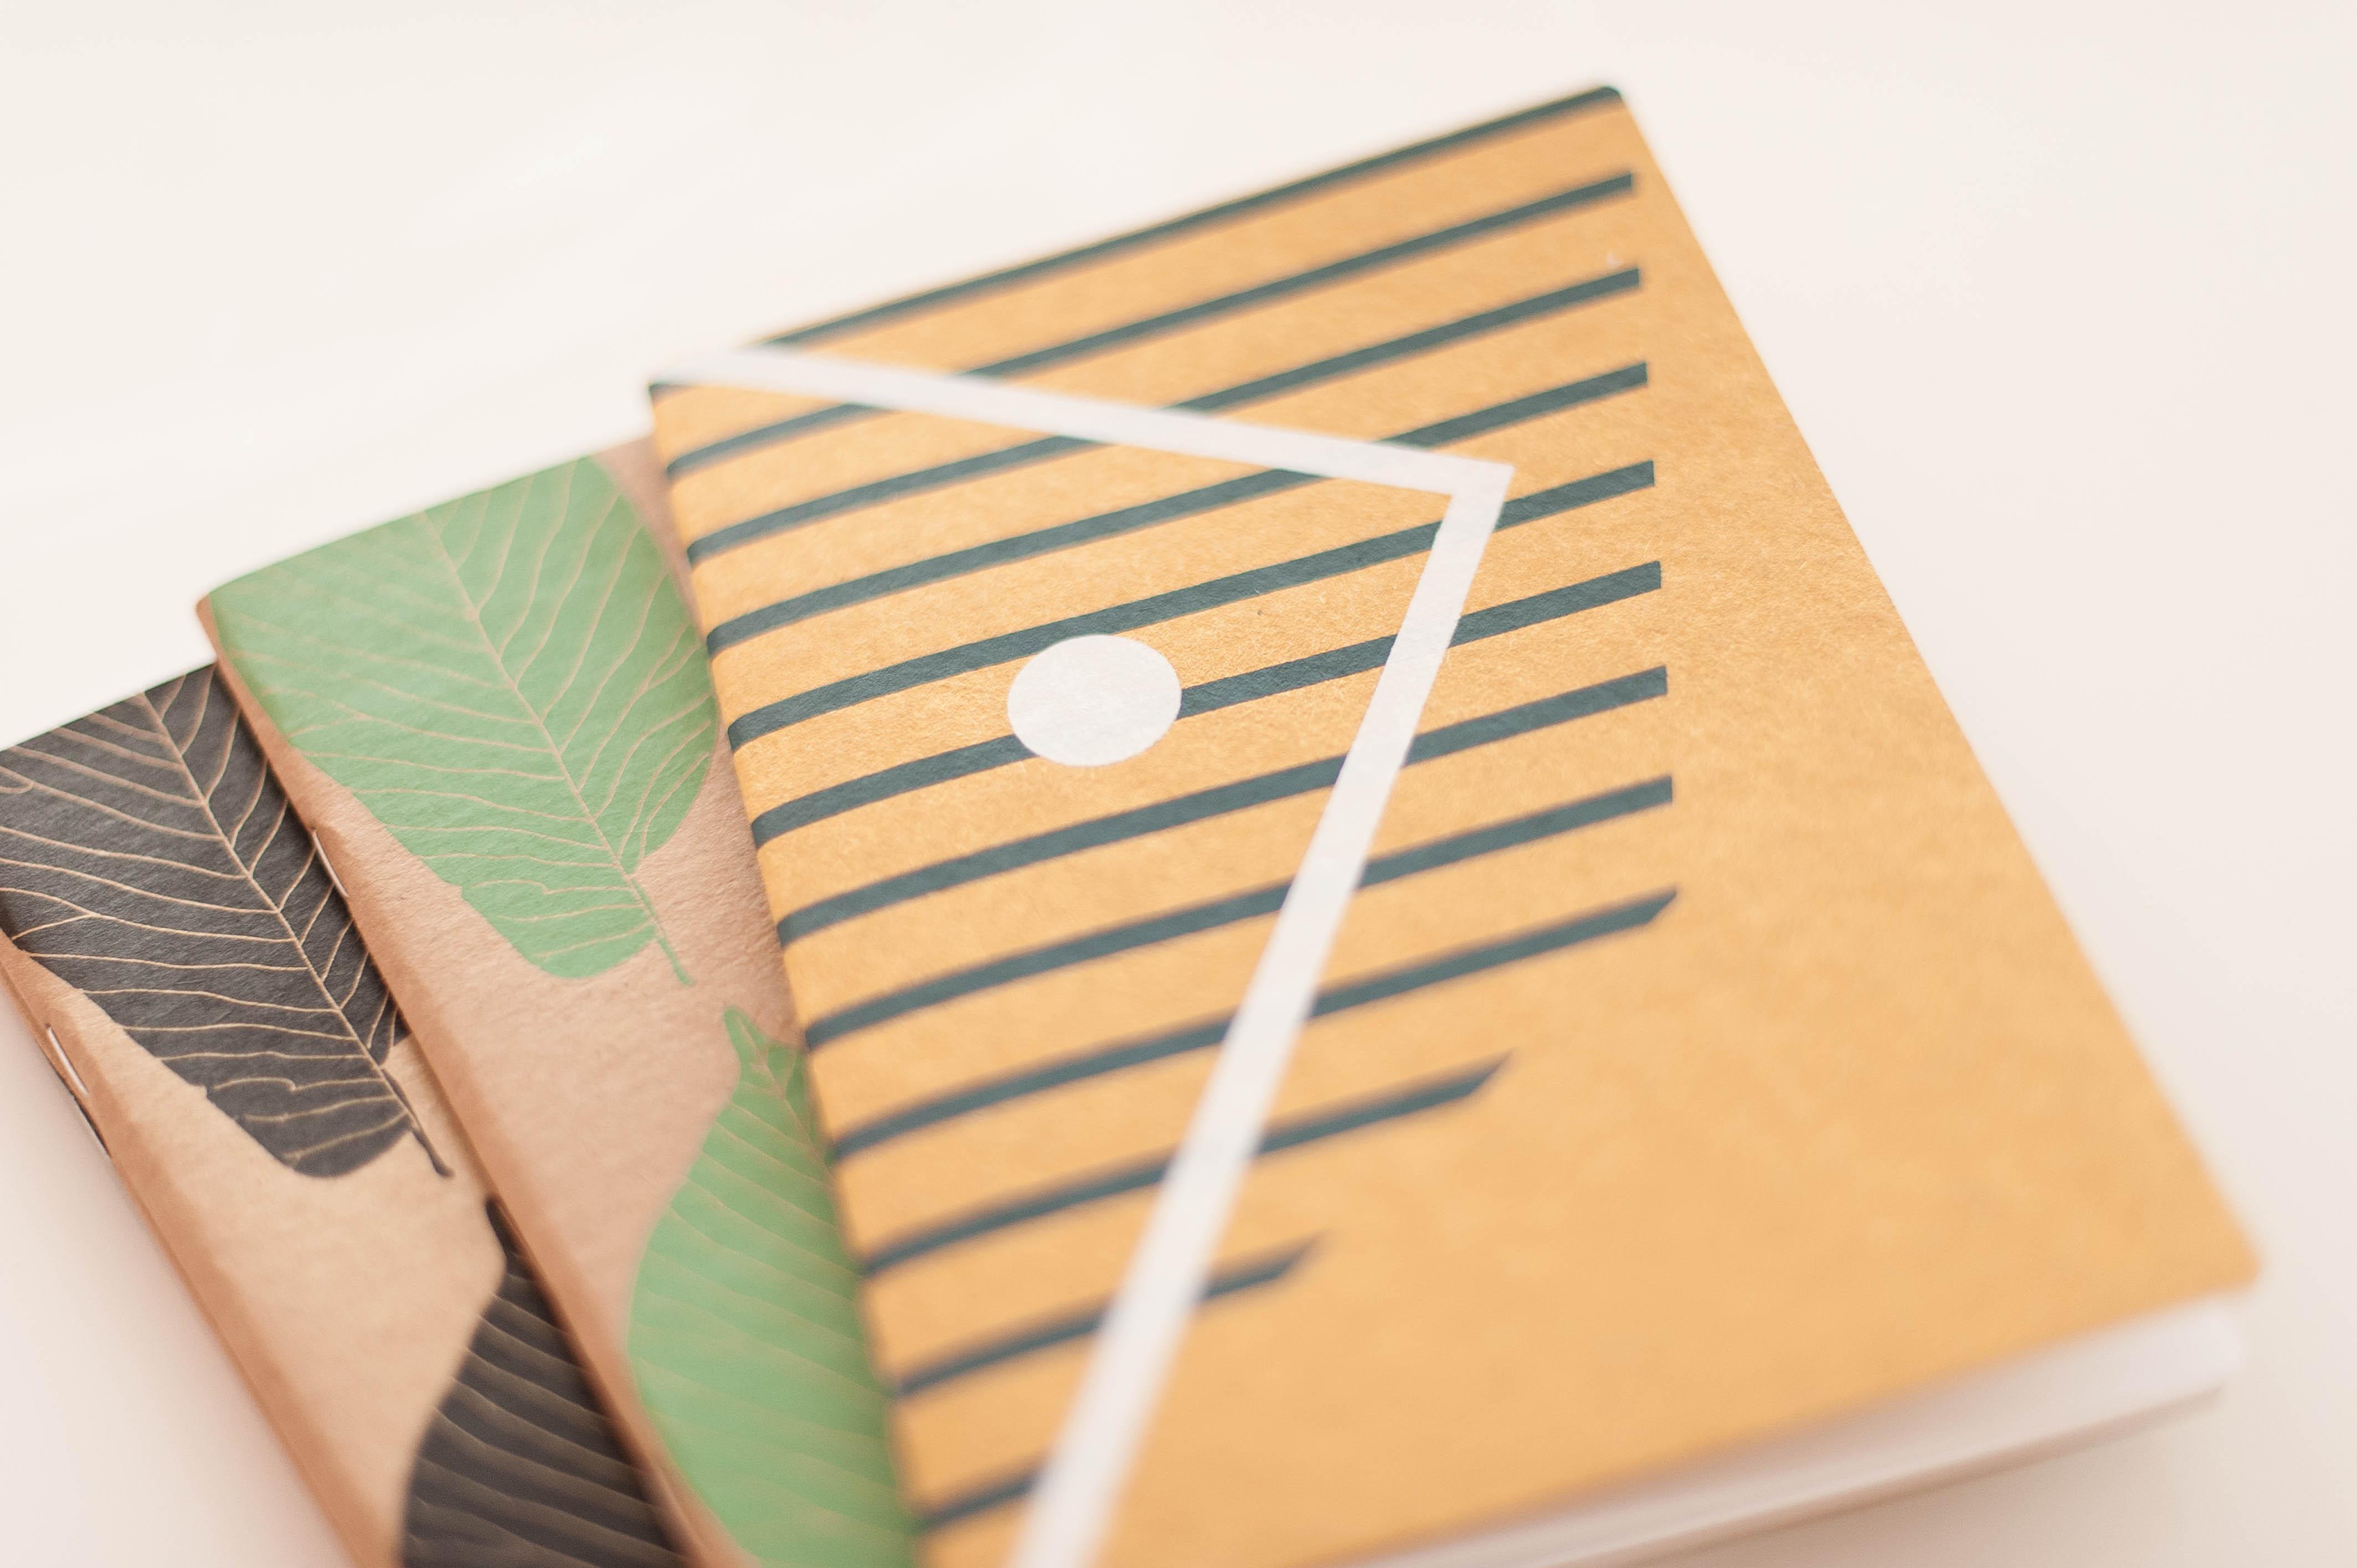 Noe-paper (concours inside)